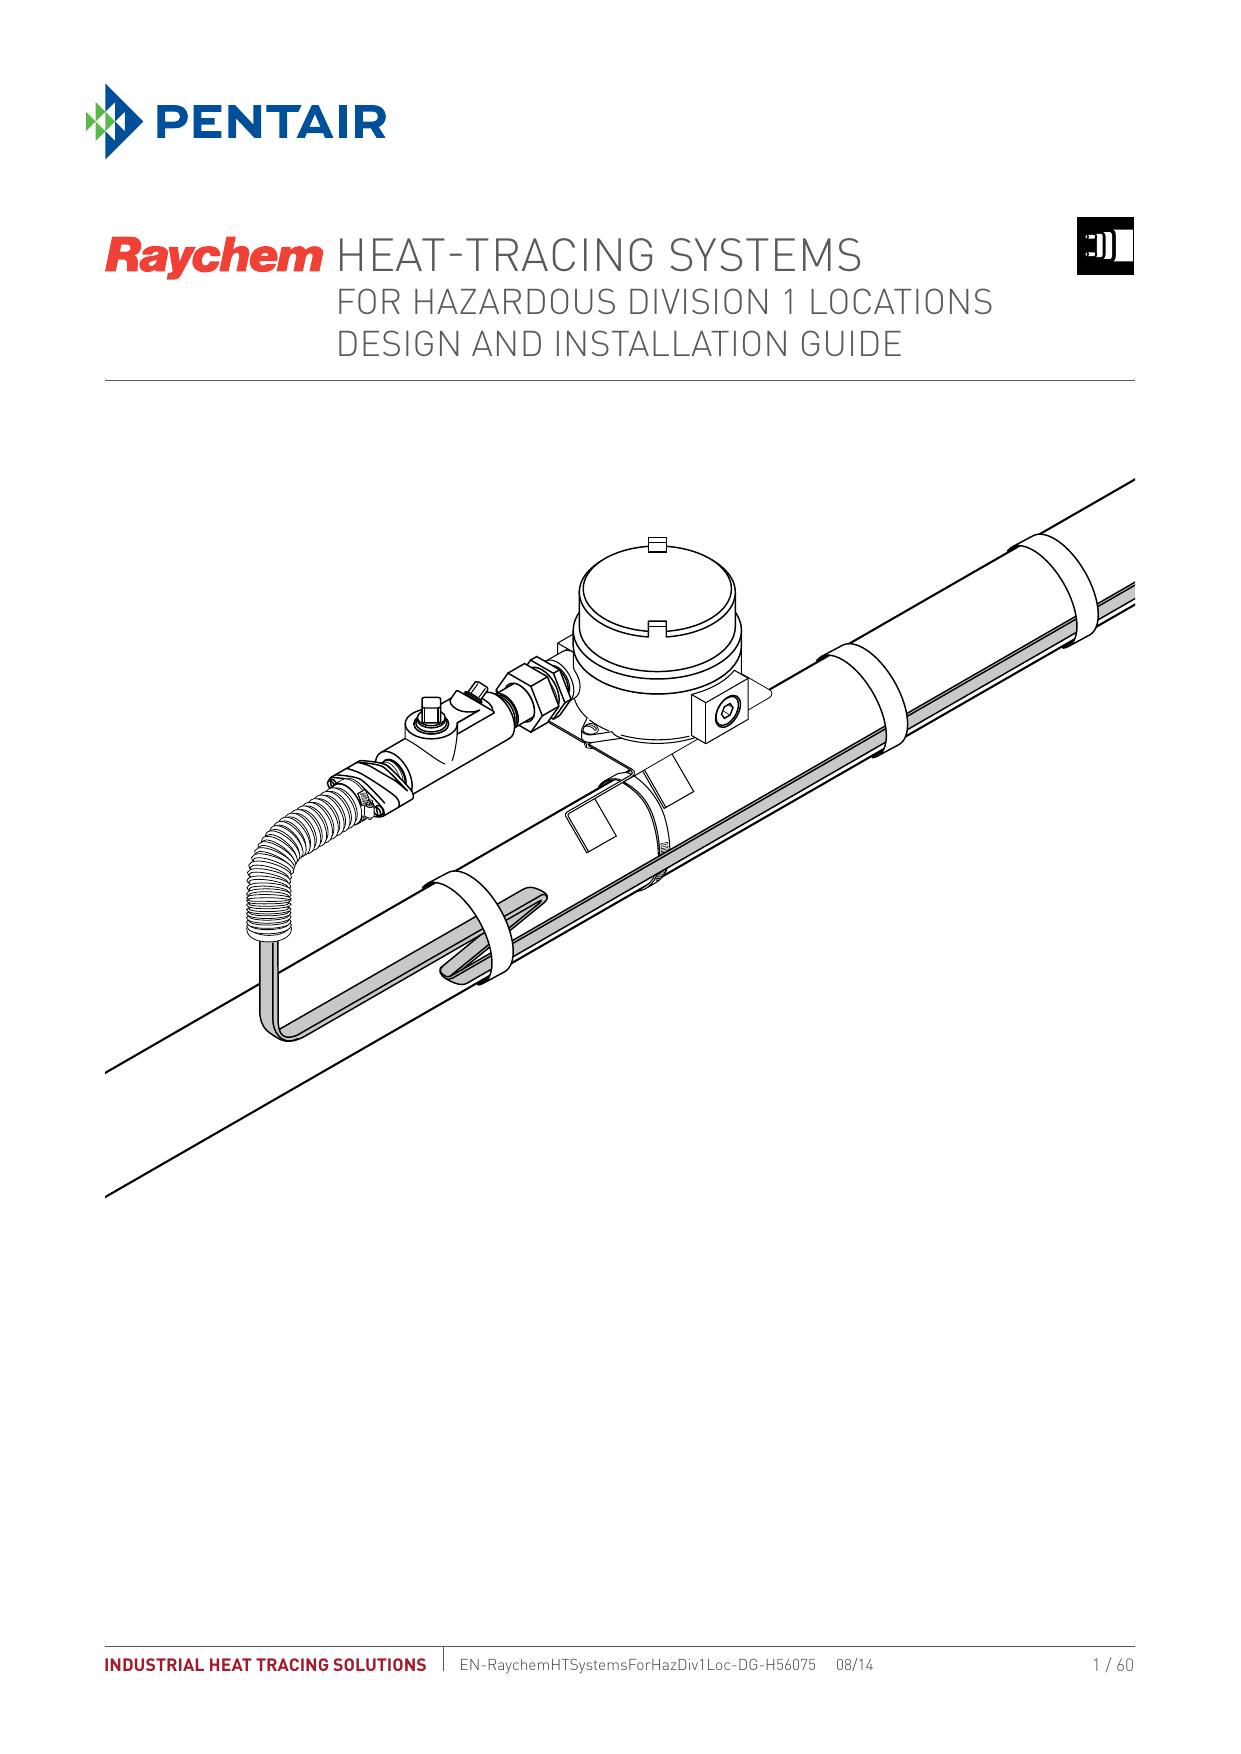 DIAGRAM] Thermon Tc 1818a Wiring Diagram FULL Version HD Quality Wiring  Diagram - EVANSENGINES.HOMMEVETEMENTS.FRevansengines.hommevetements.fr